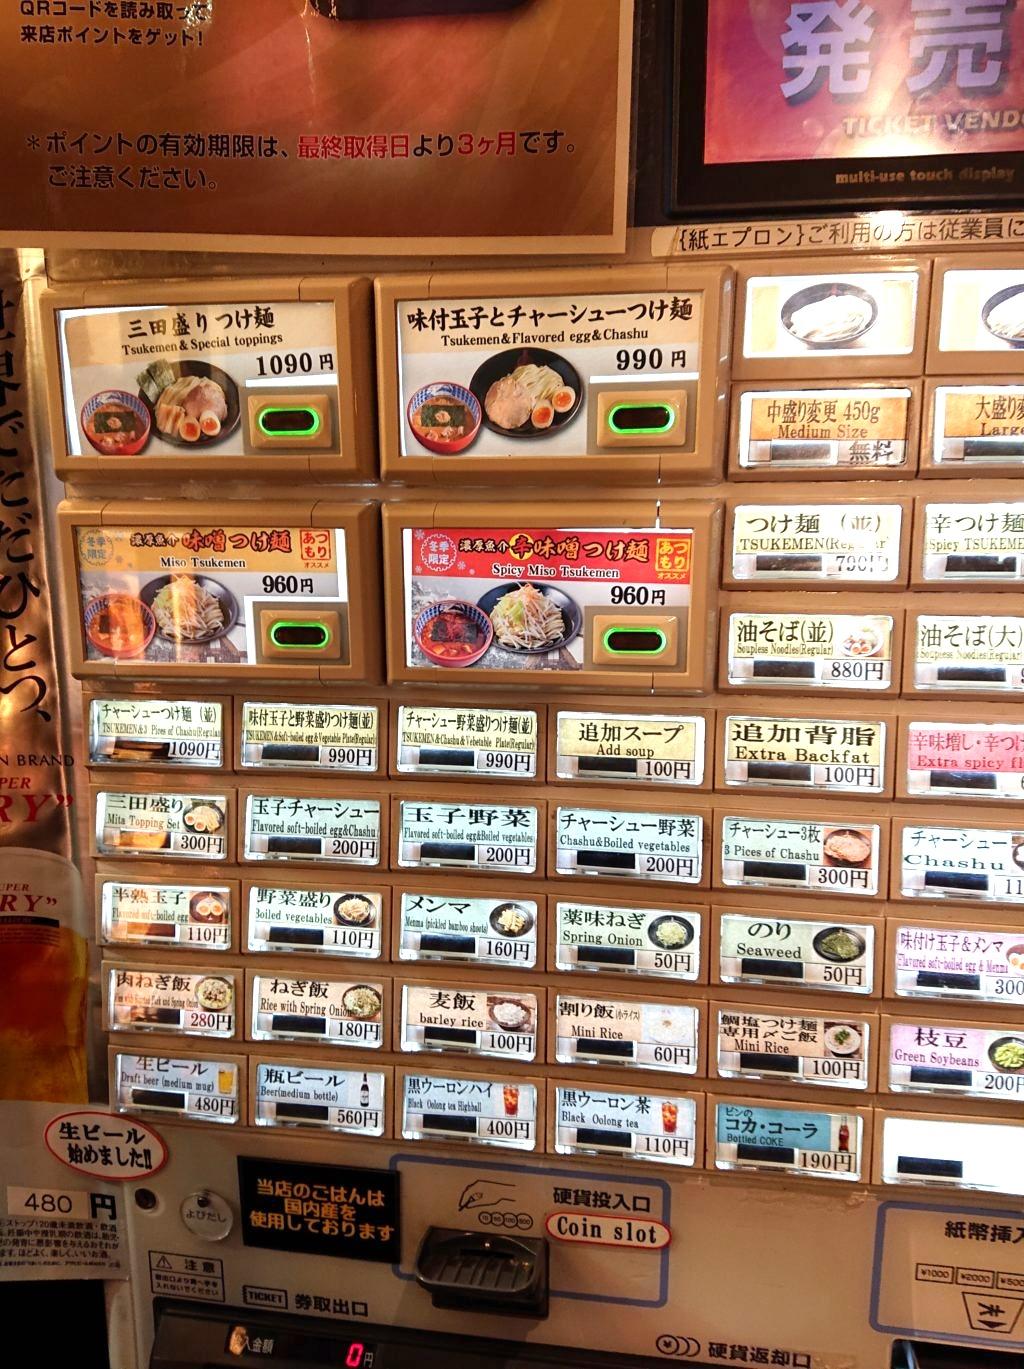 三田製麺所 恵比寿南店 食券気のメニュー